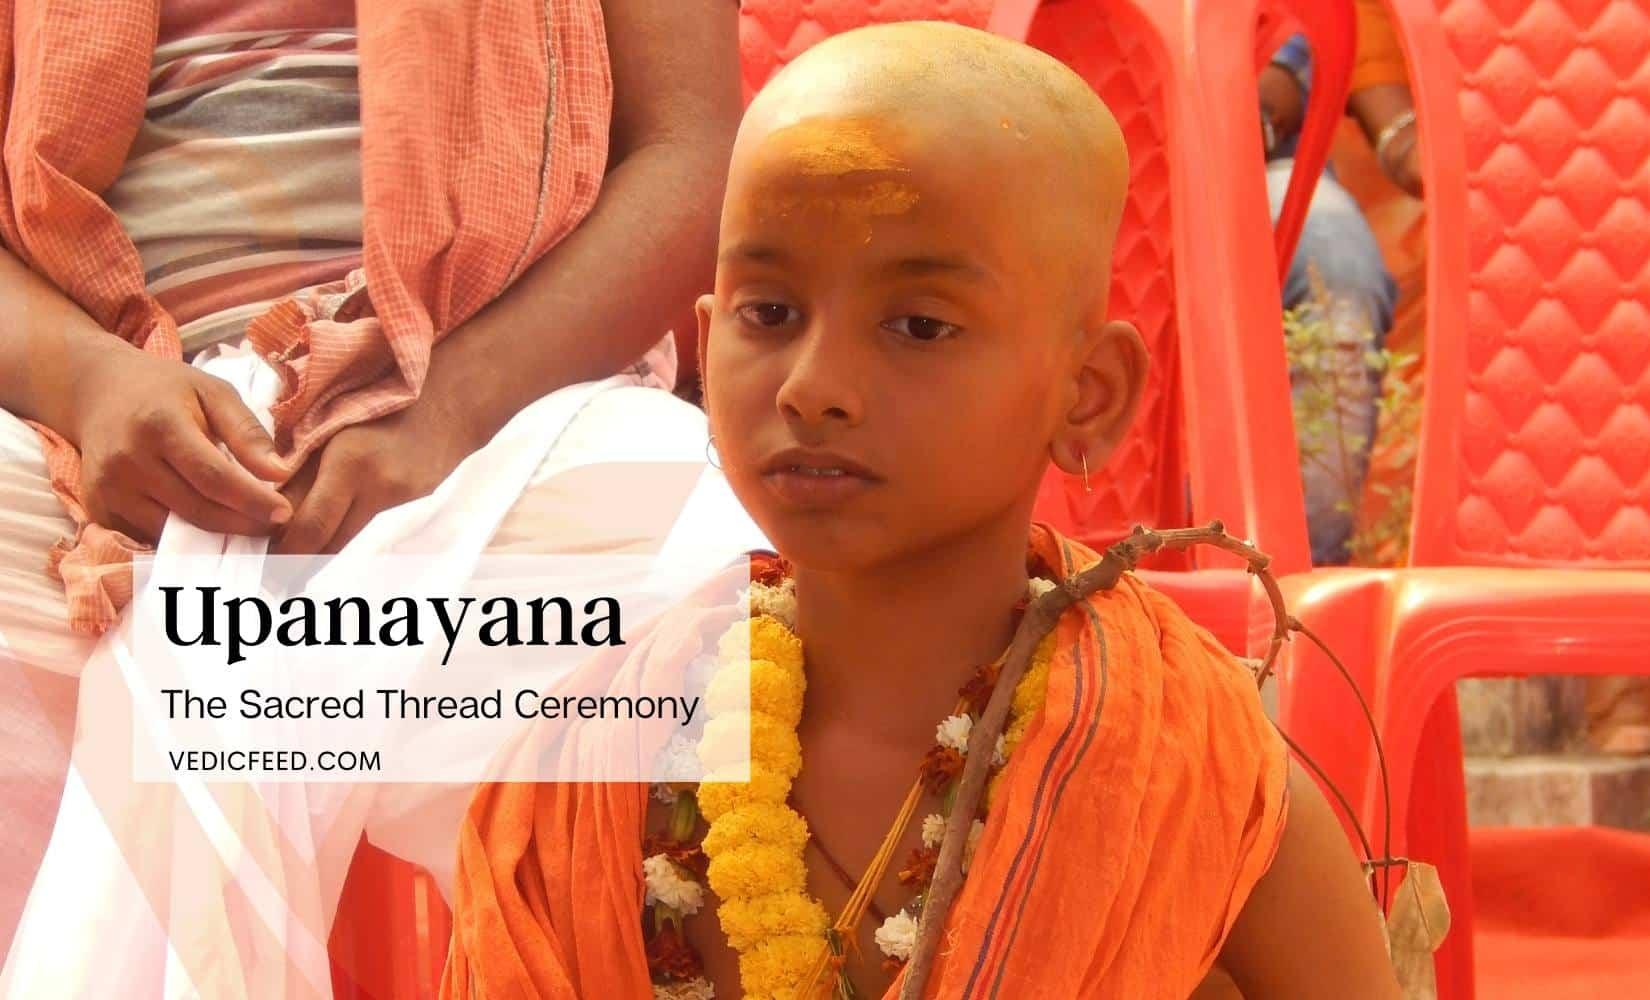 Upanayana - The Sacred Thread Ceremony